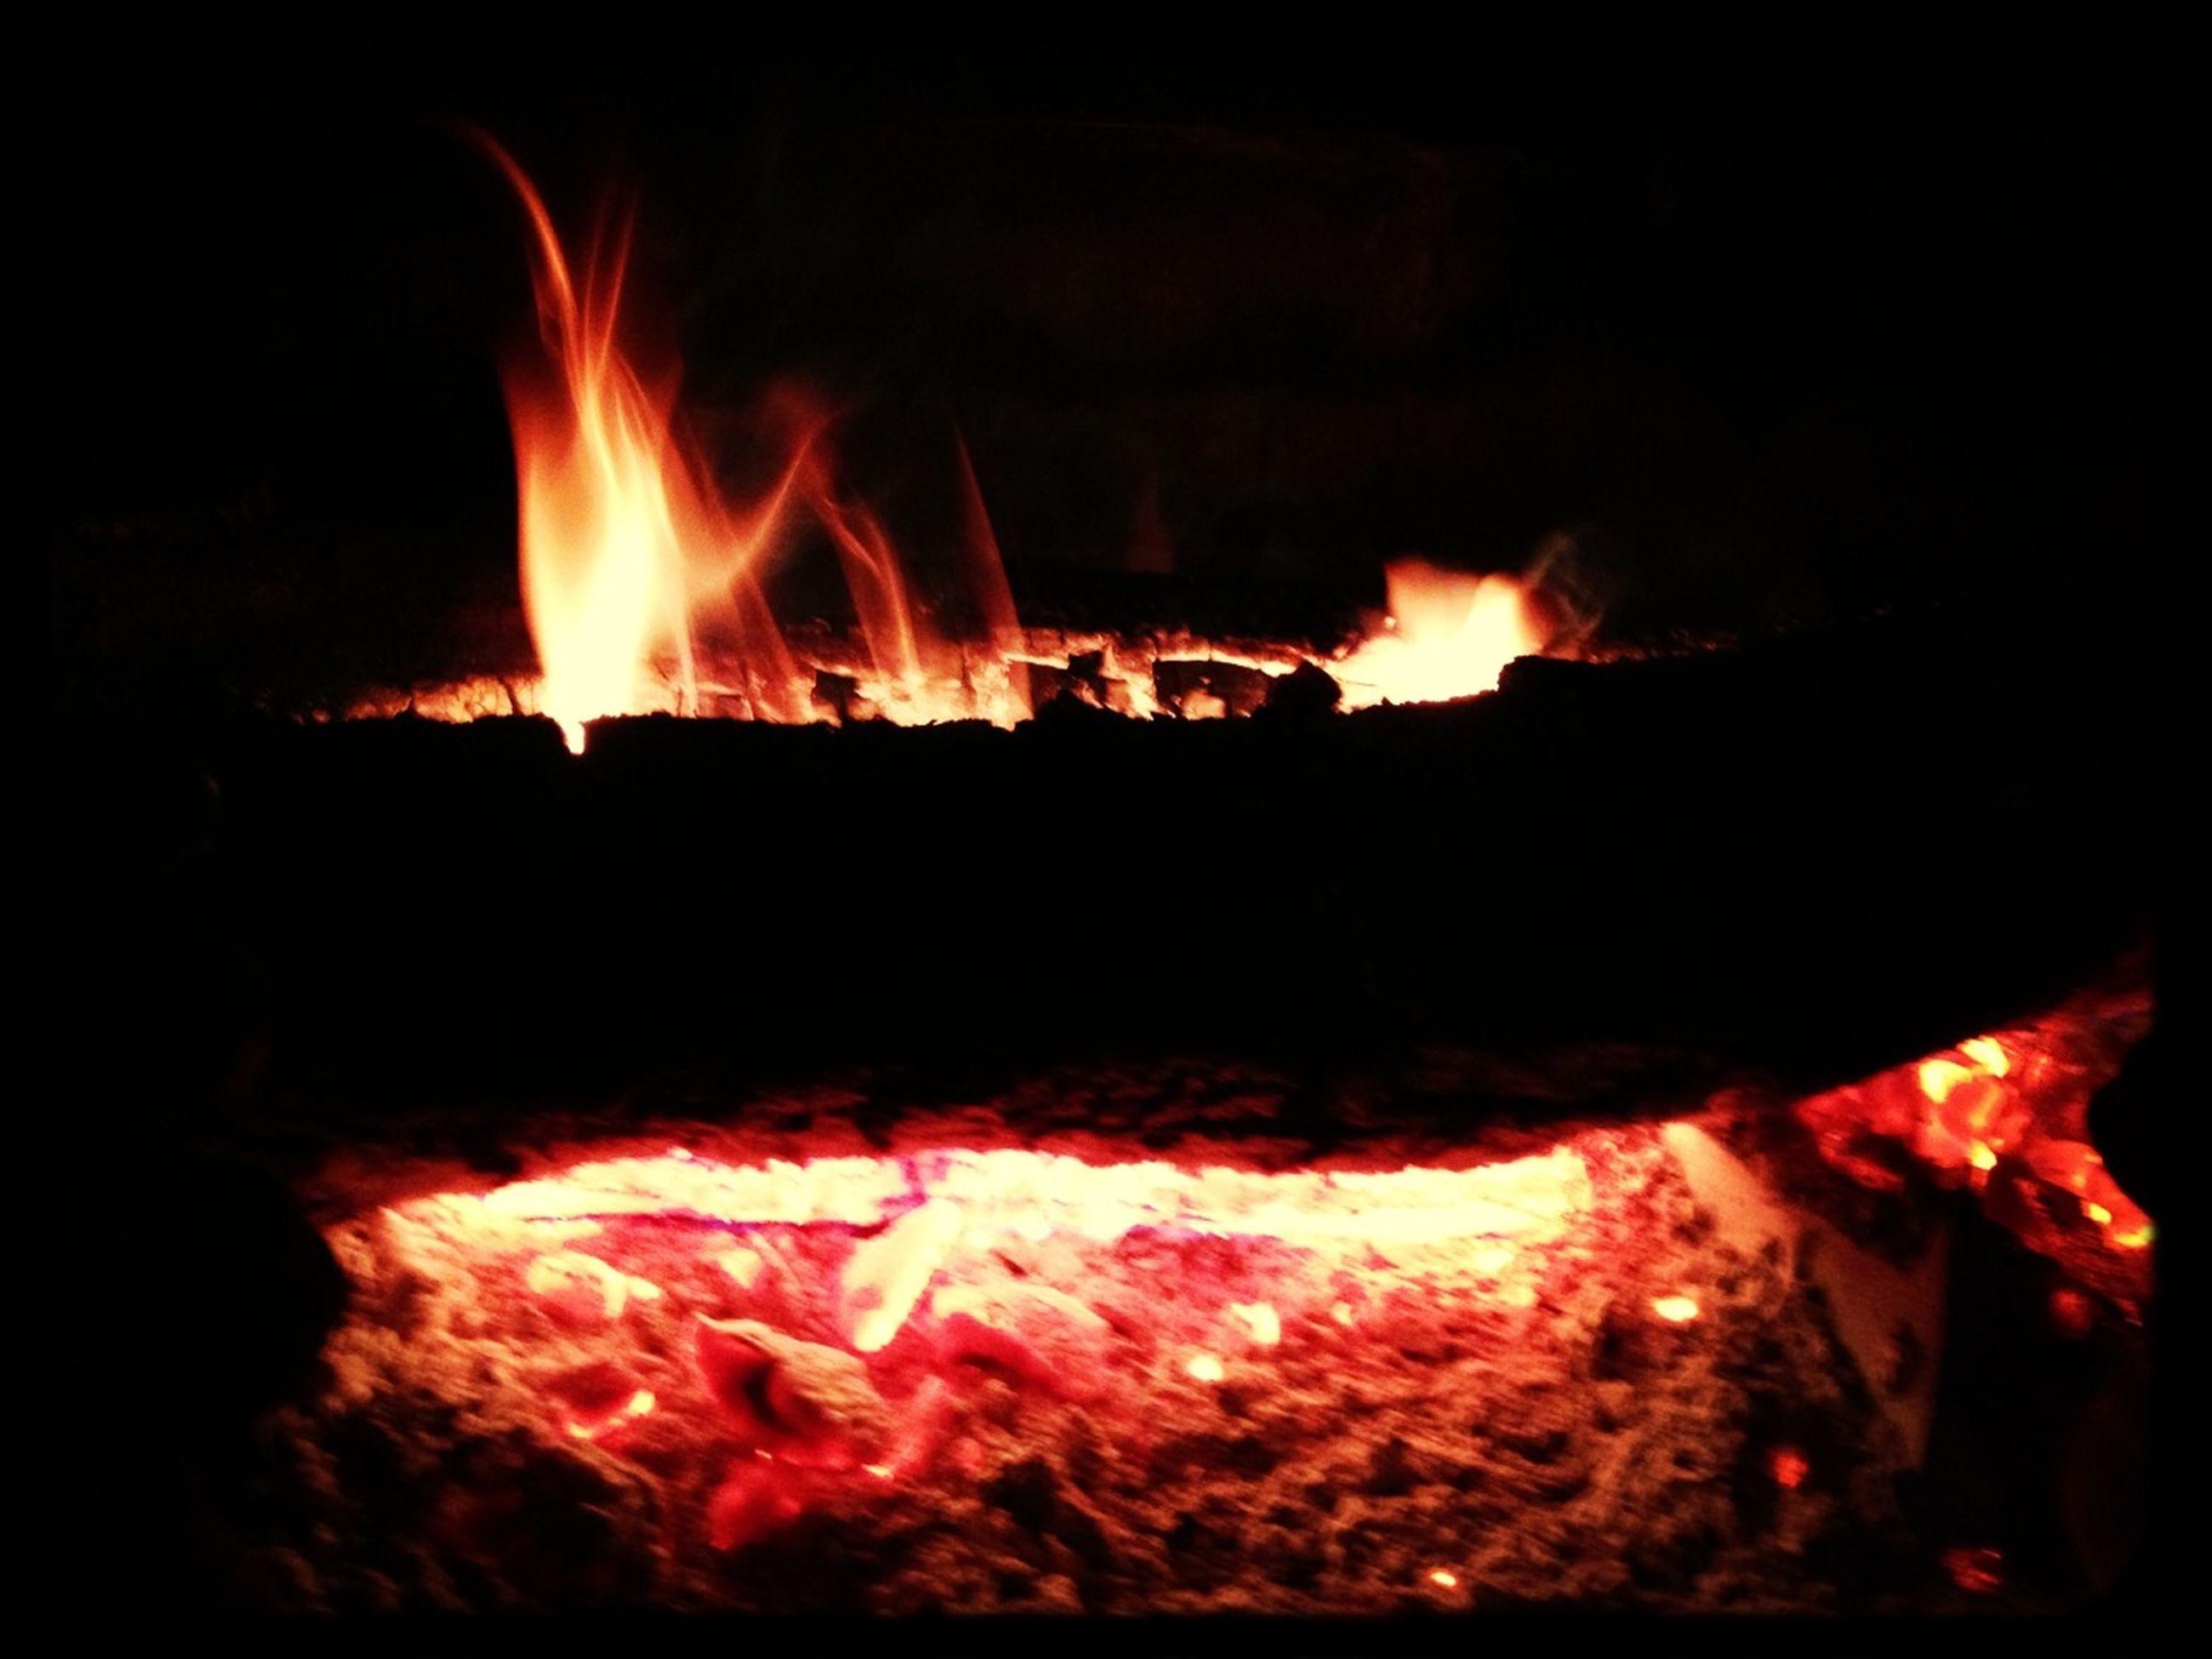 burning, flame, fire - natural phenomenon, heat - temperature, glowing, night, bonfire, fire, orange color, heat, firewood, campfire, motion, illuminated, dark, close-up, light - natural phenomenon, long exposure, no people, lit